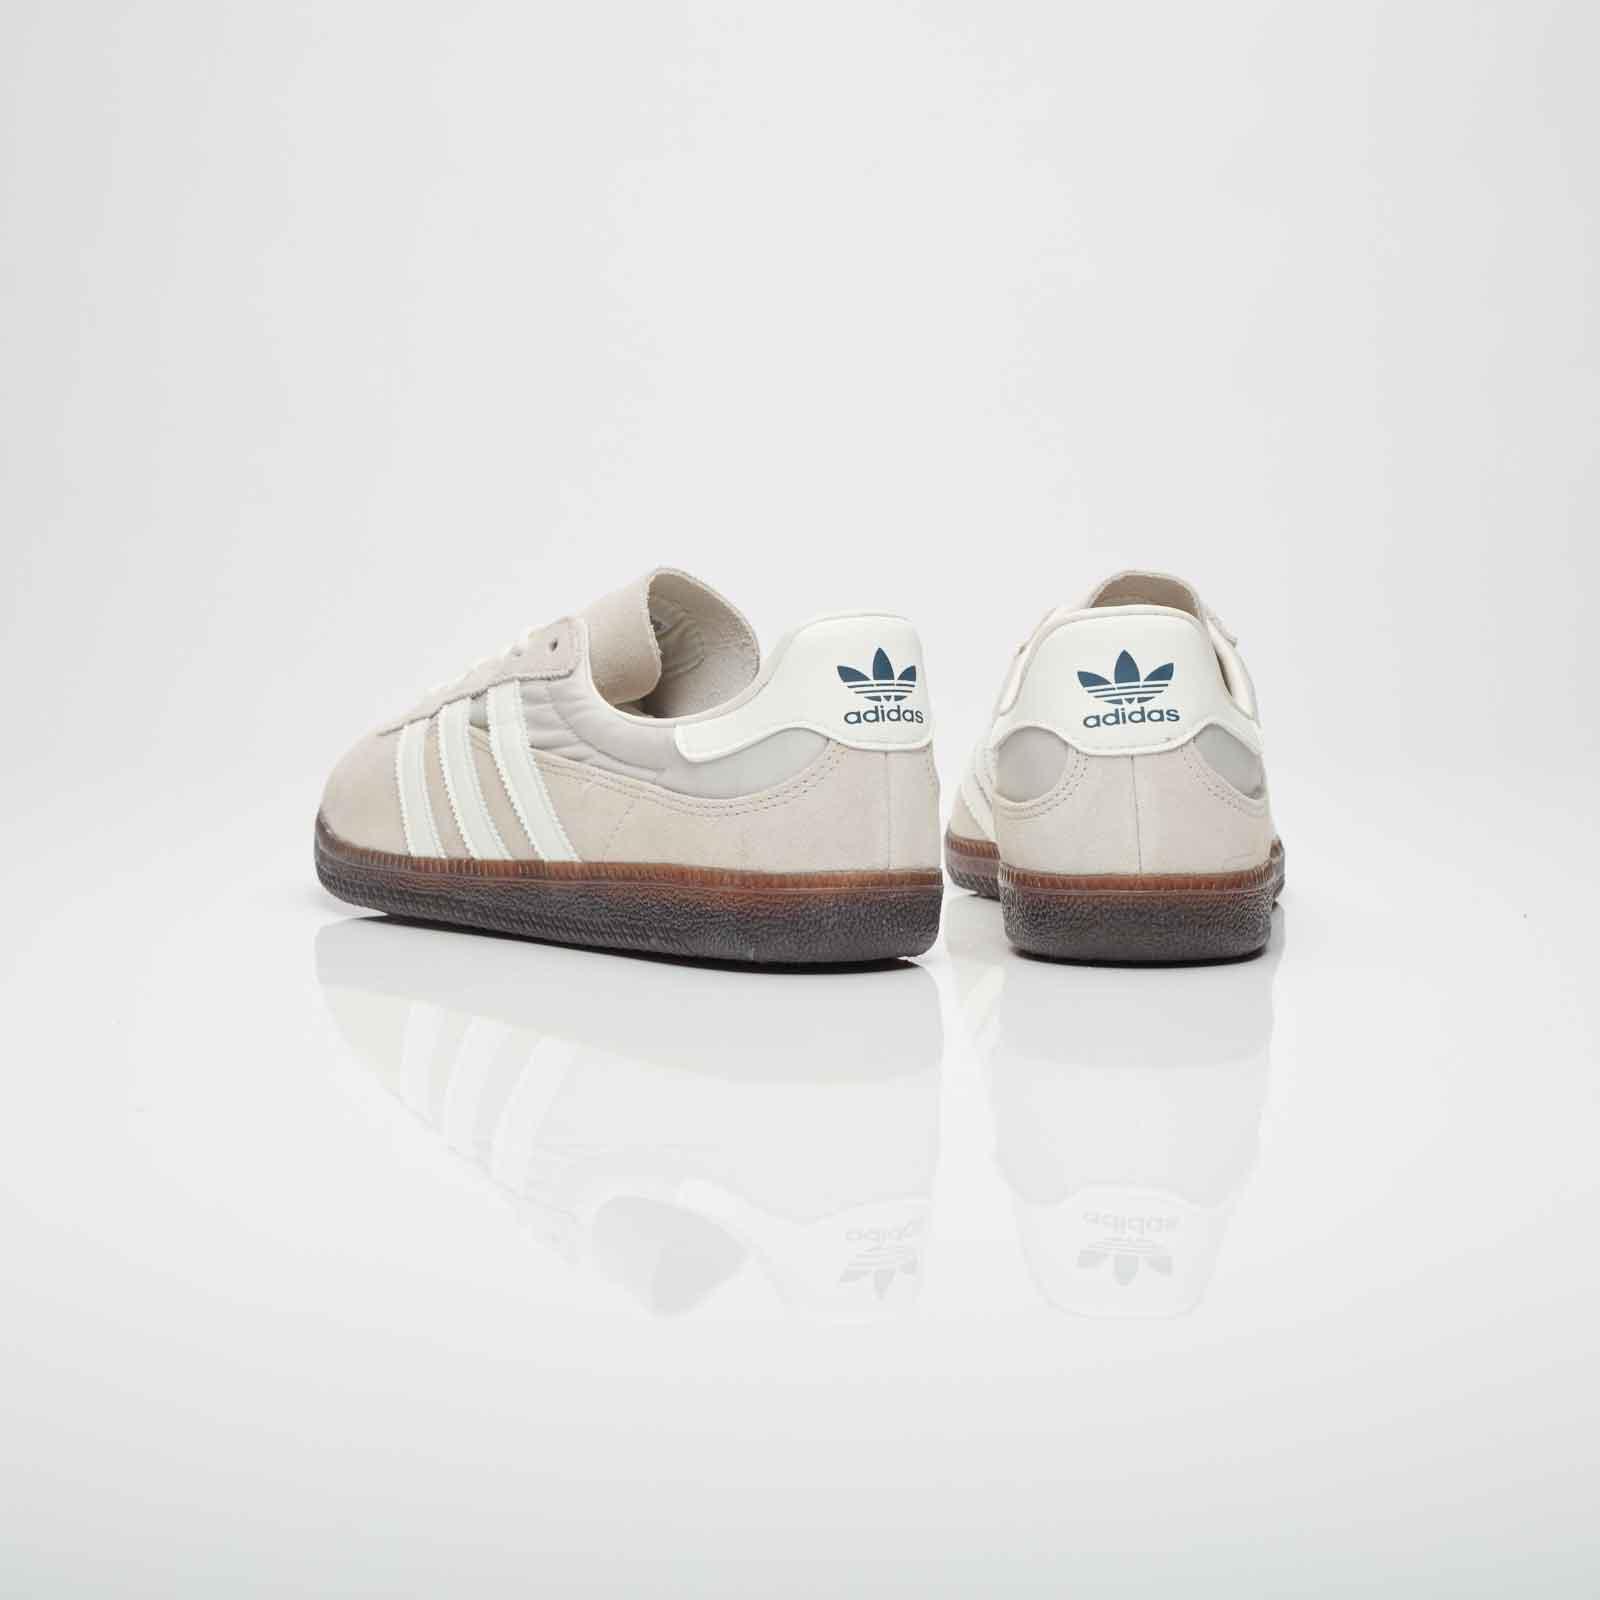 pretty nice 8895b 1c233 adidas Originals Spezial Gt Wensley adidas Originals Spezial Gt Wensley ...